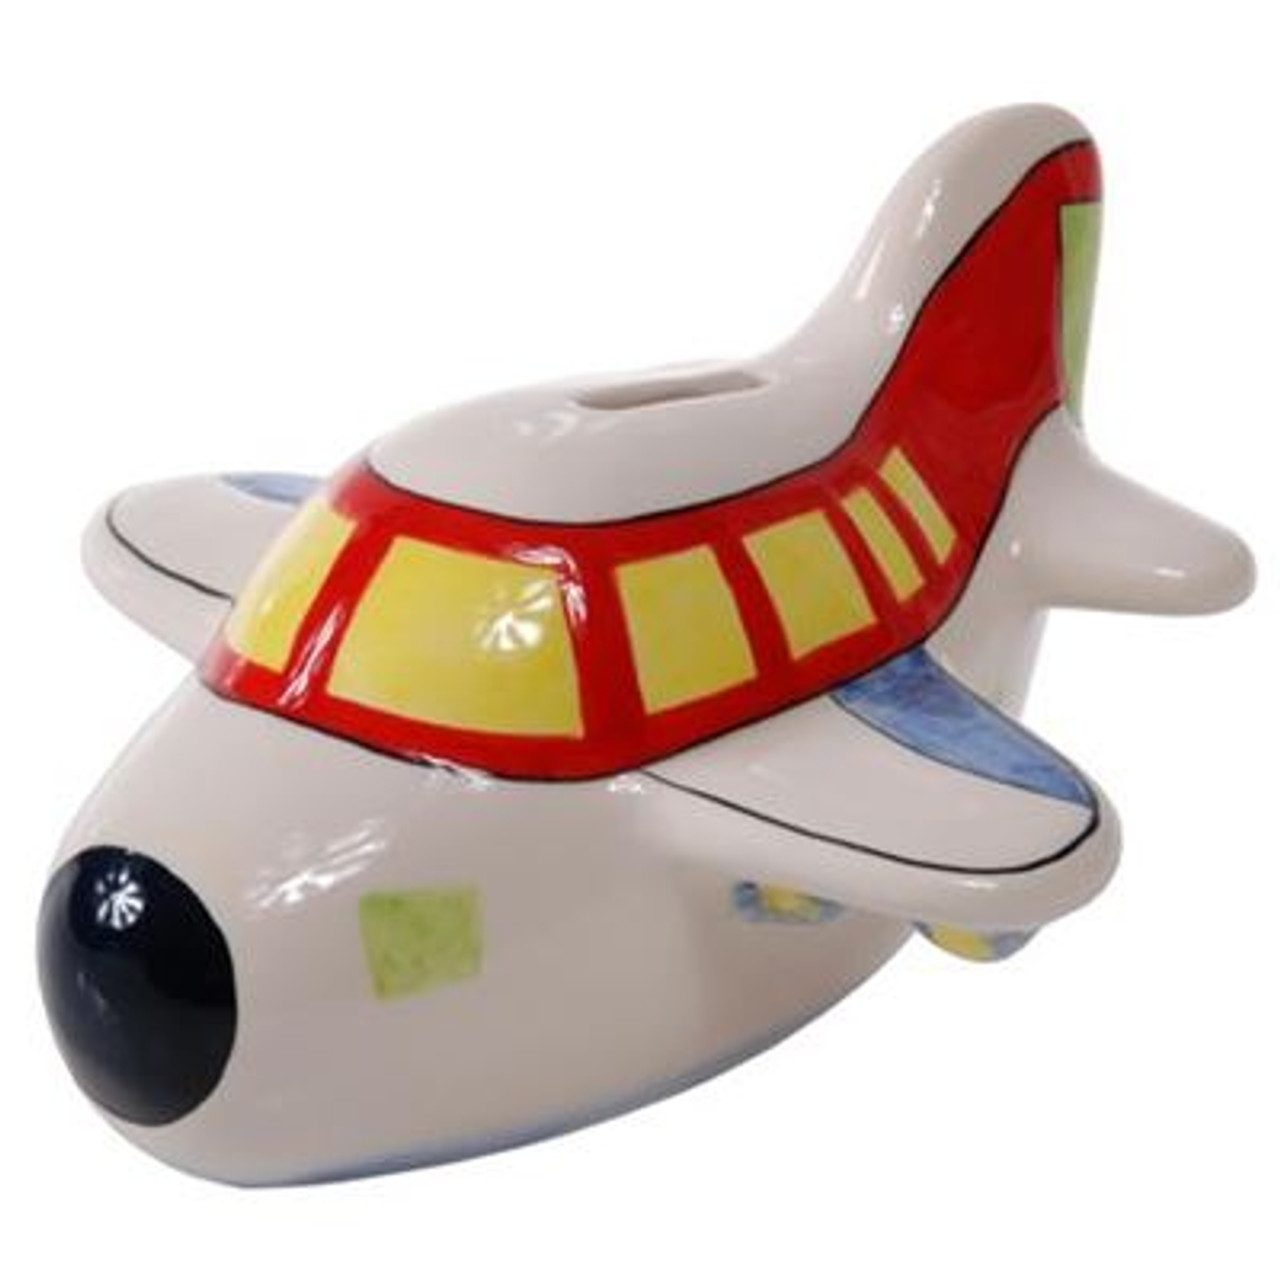 Kennedy the Aeroplane ceramic money bank